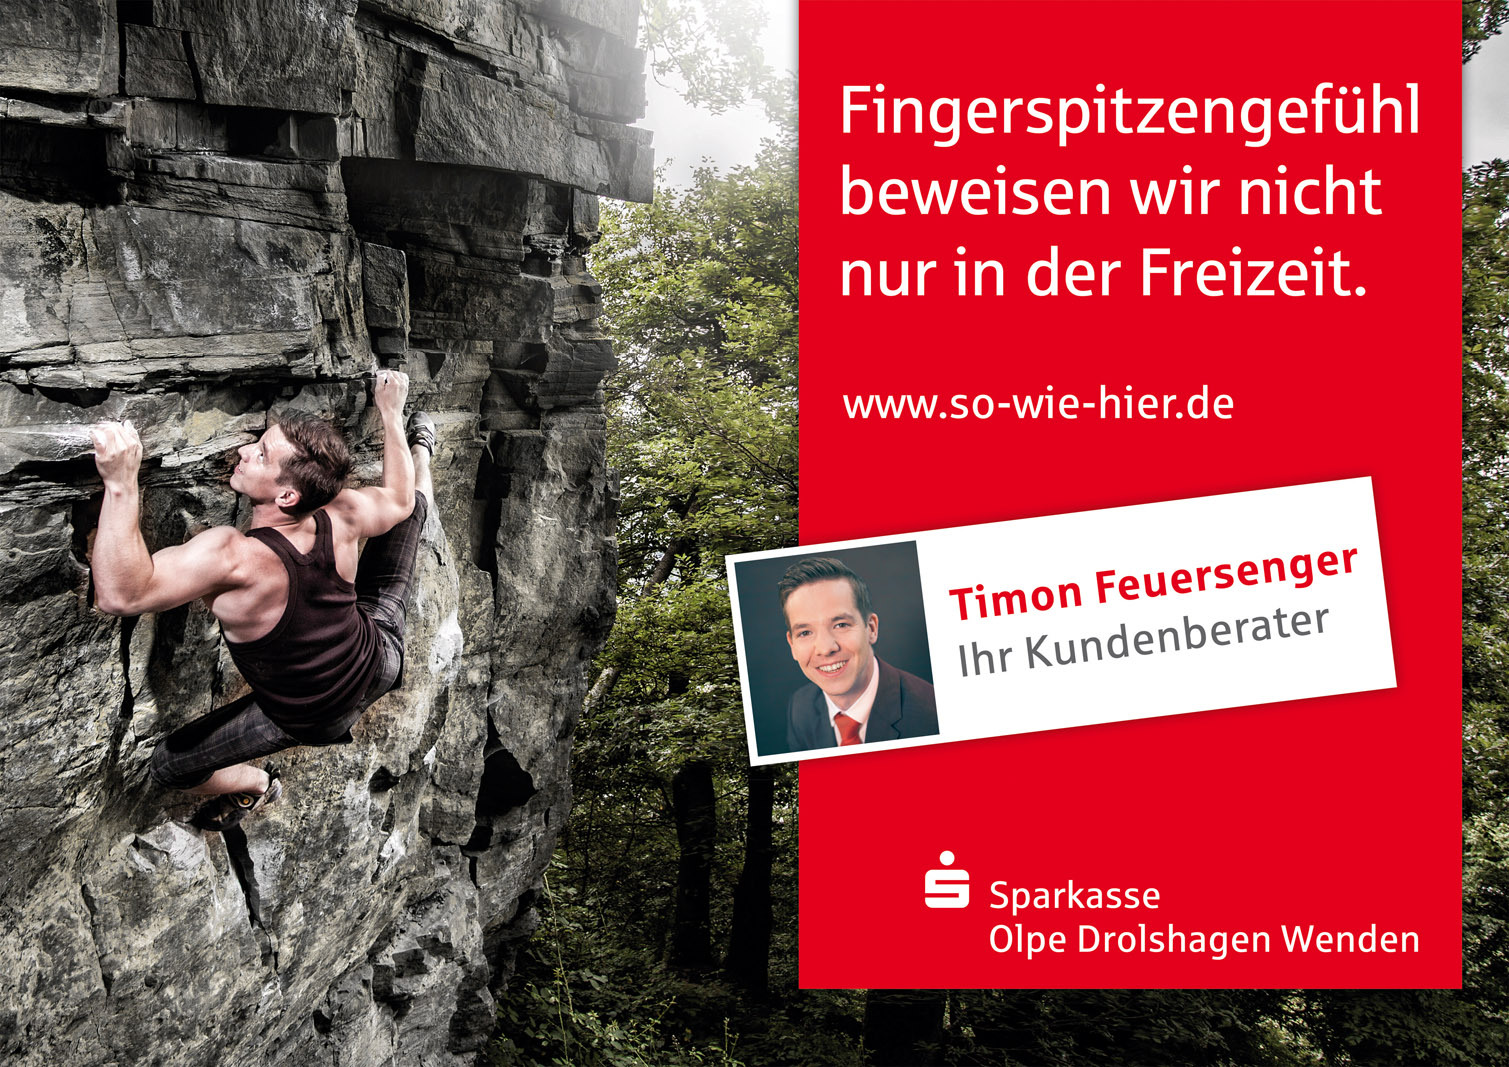 kampagne-sparkasse-olpe-drolshagen-wenden017